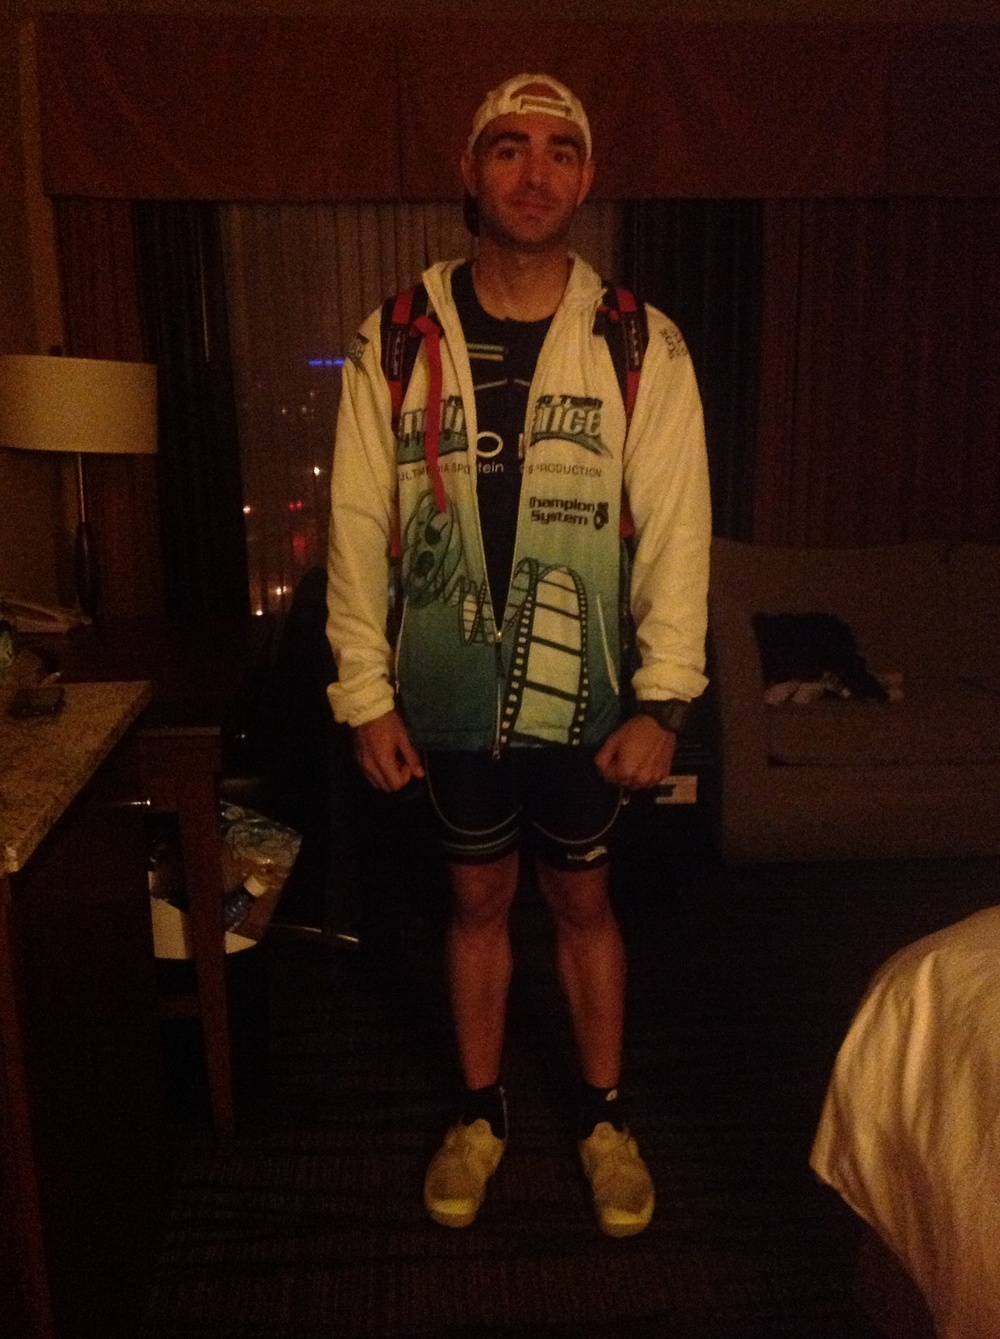 Ready to go pre race!